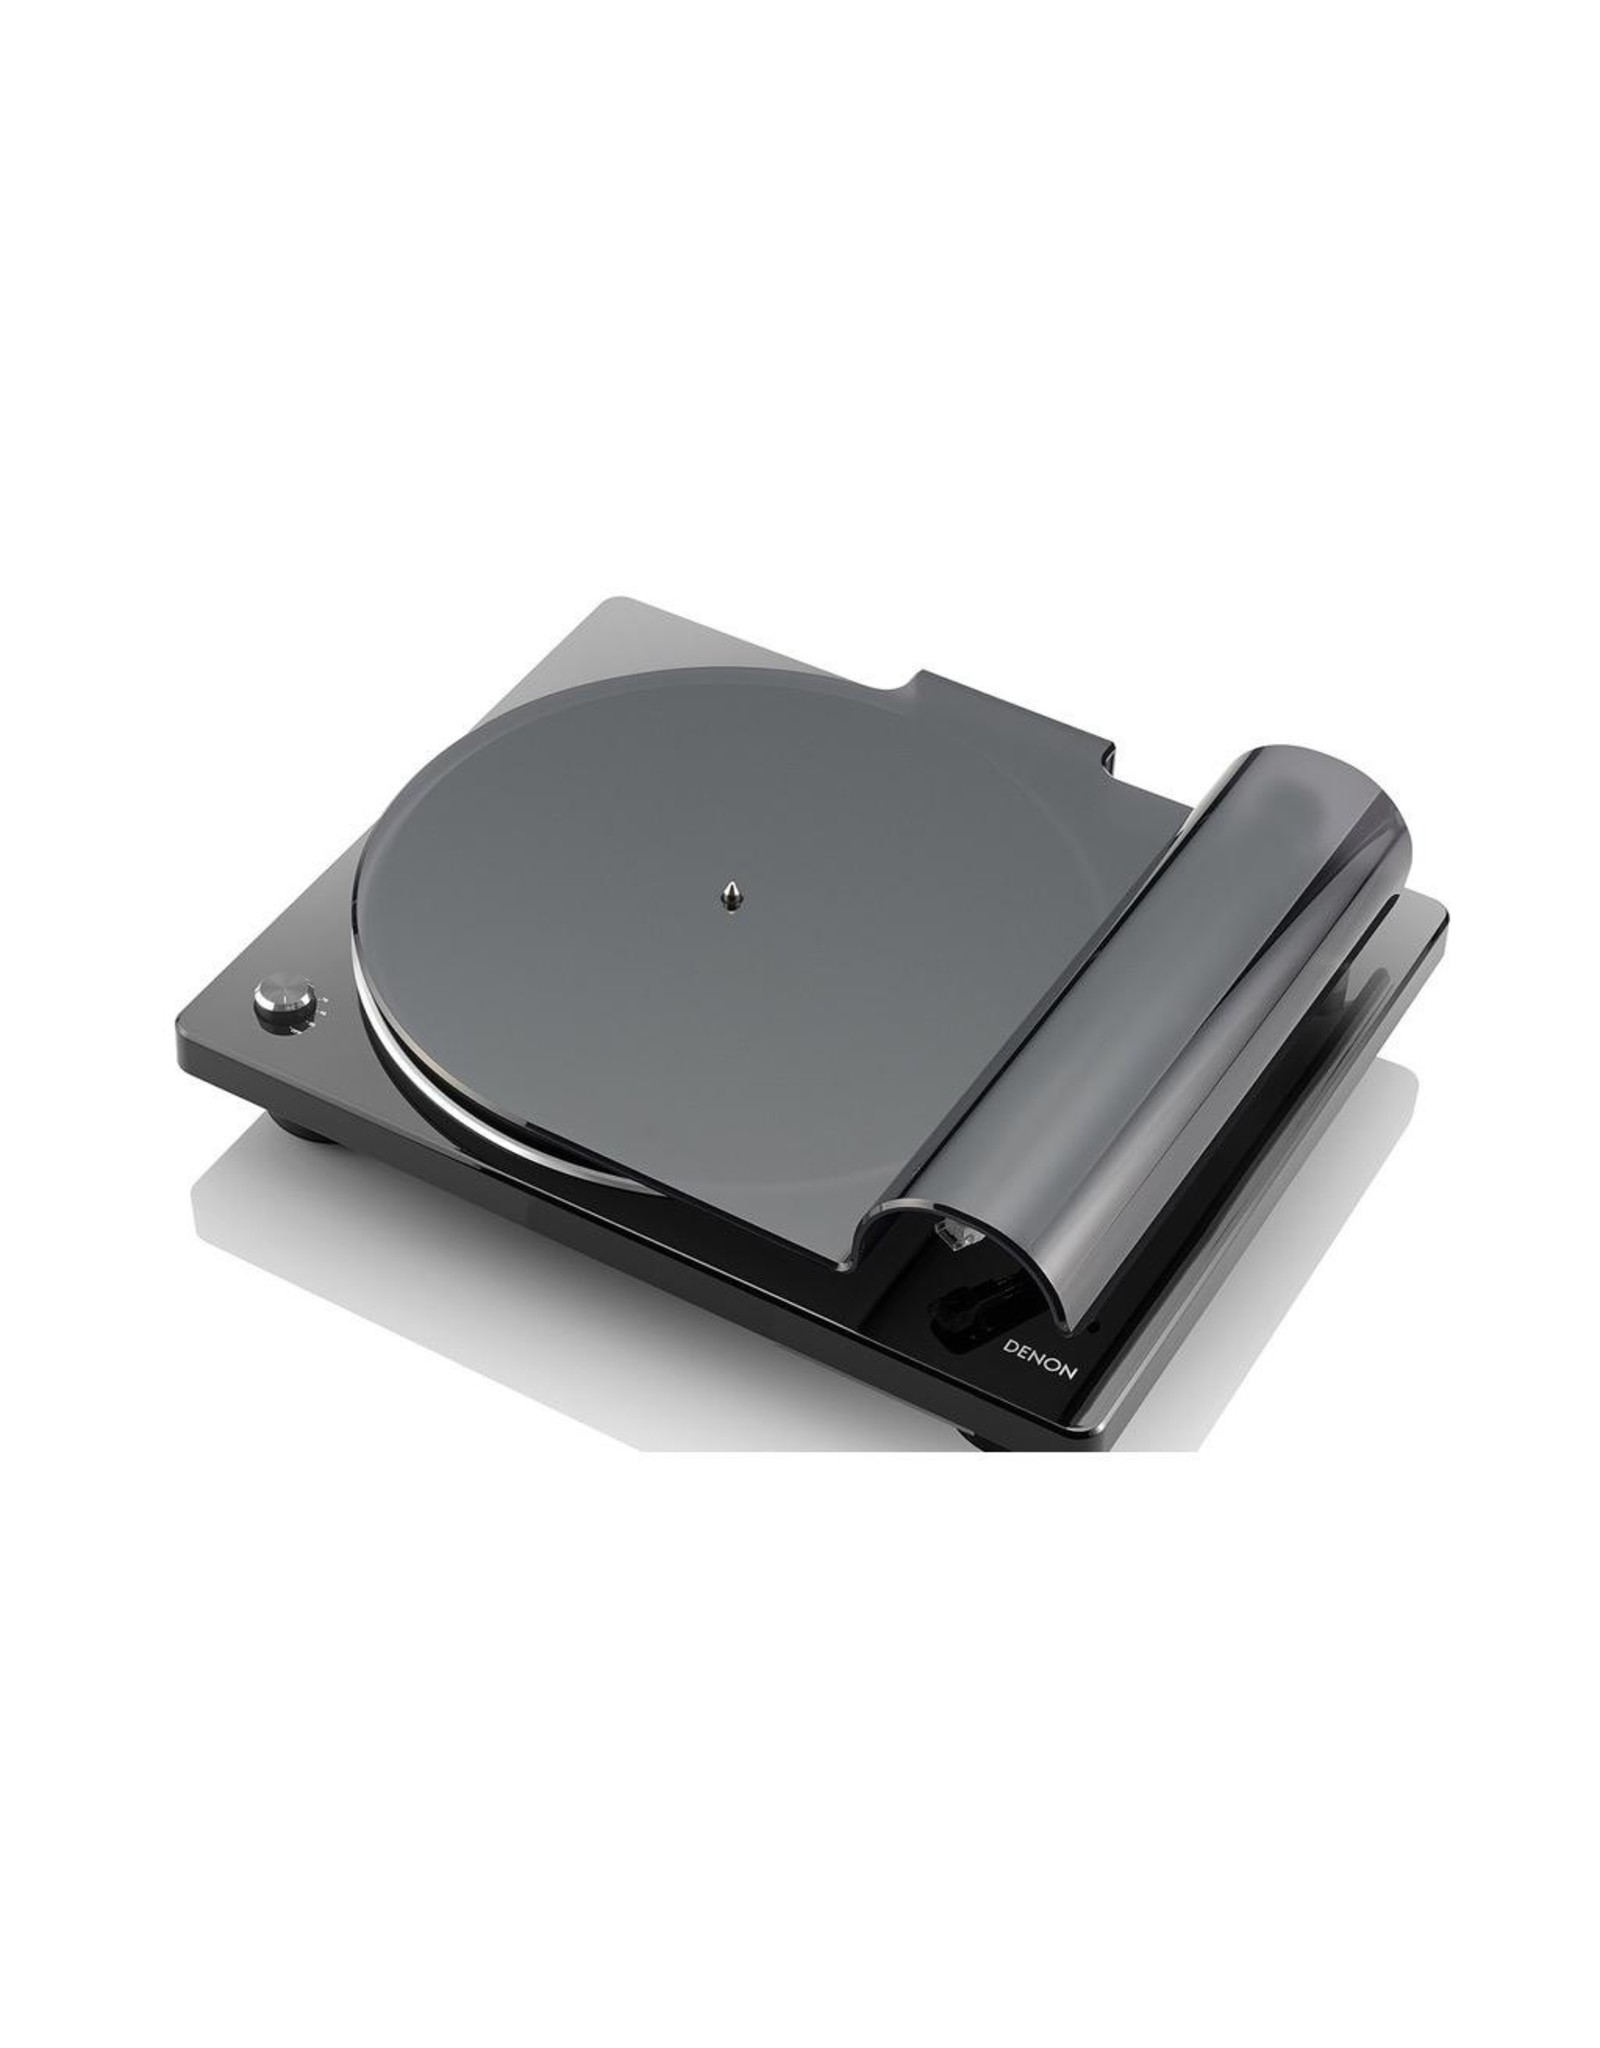 DENON DENON DP-400 Manual Turntable BLACK